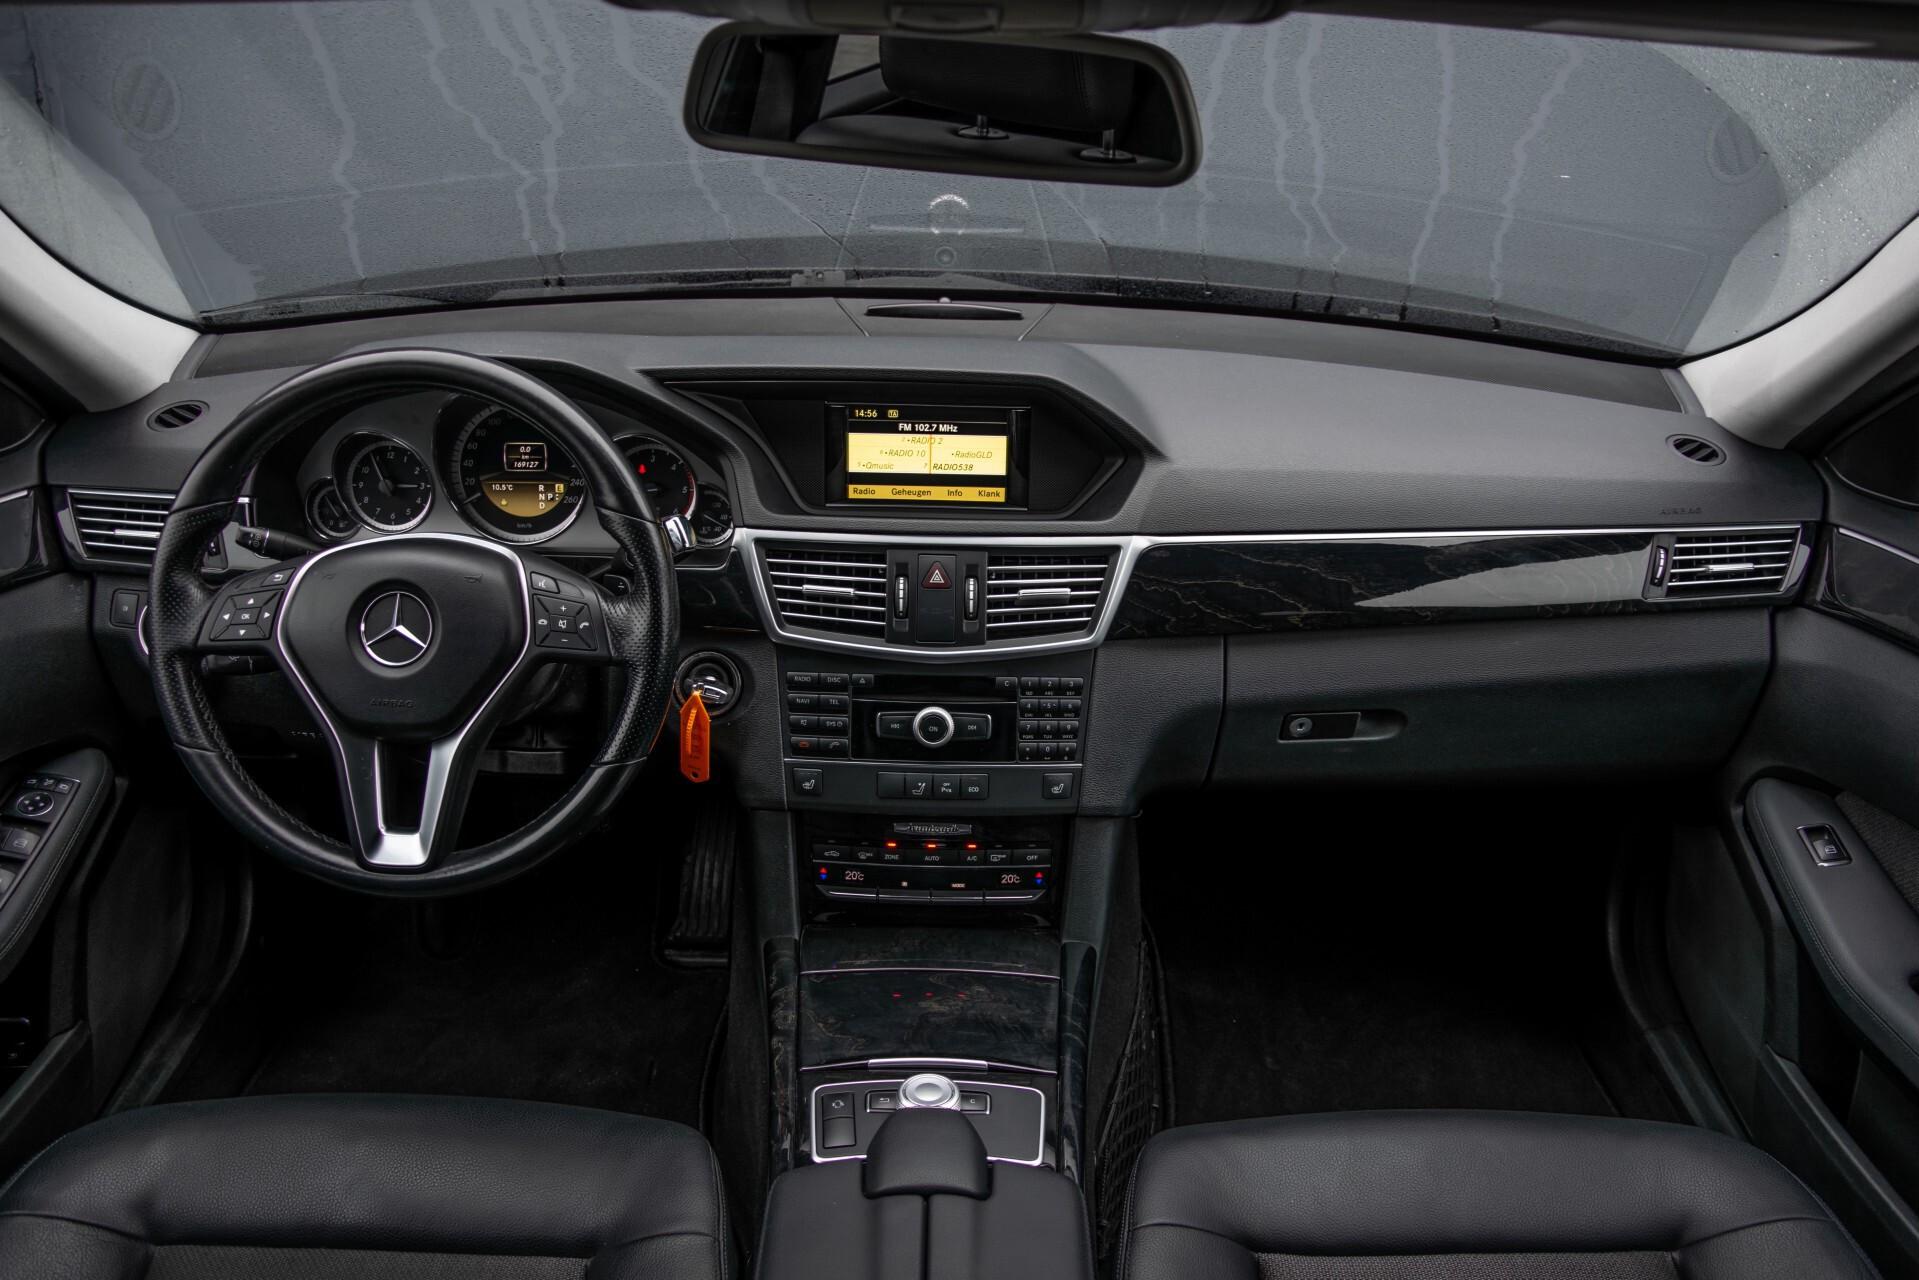 "Mercedes-Benz E-Klasse Estate 220 Cdi Avantgarde Wegklapbare trekhaak/18""/Privacyglas Aut7 Foto 6"